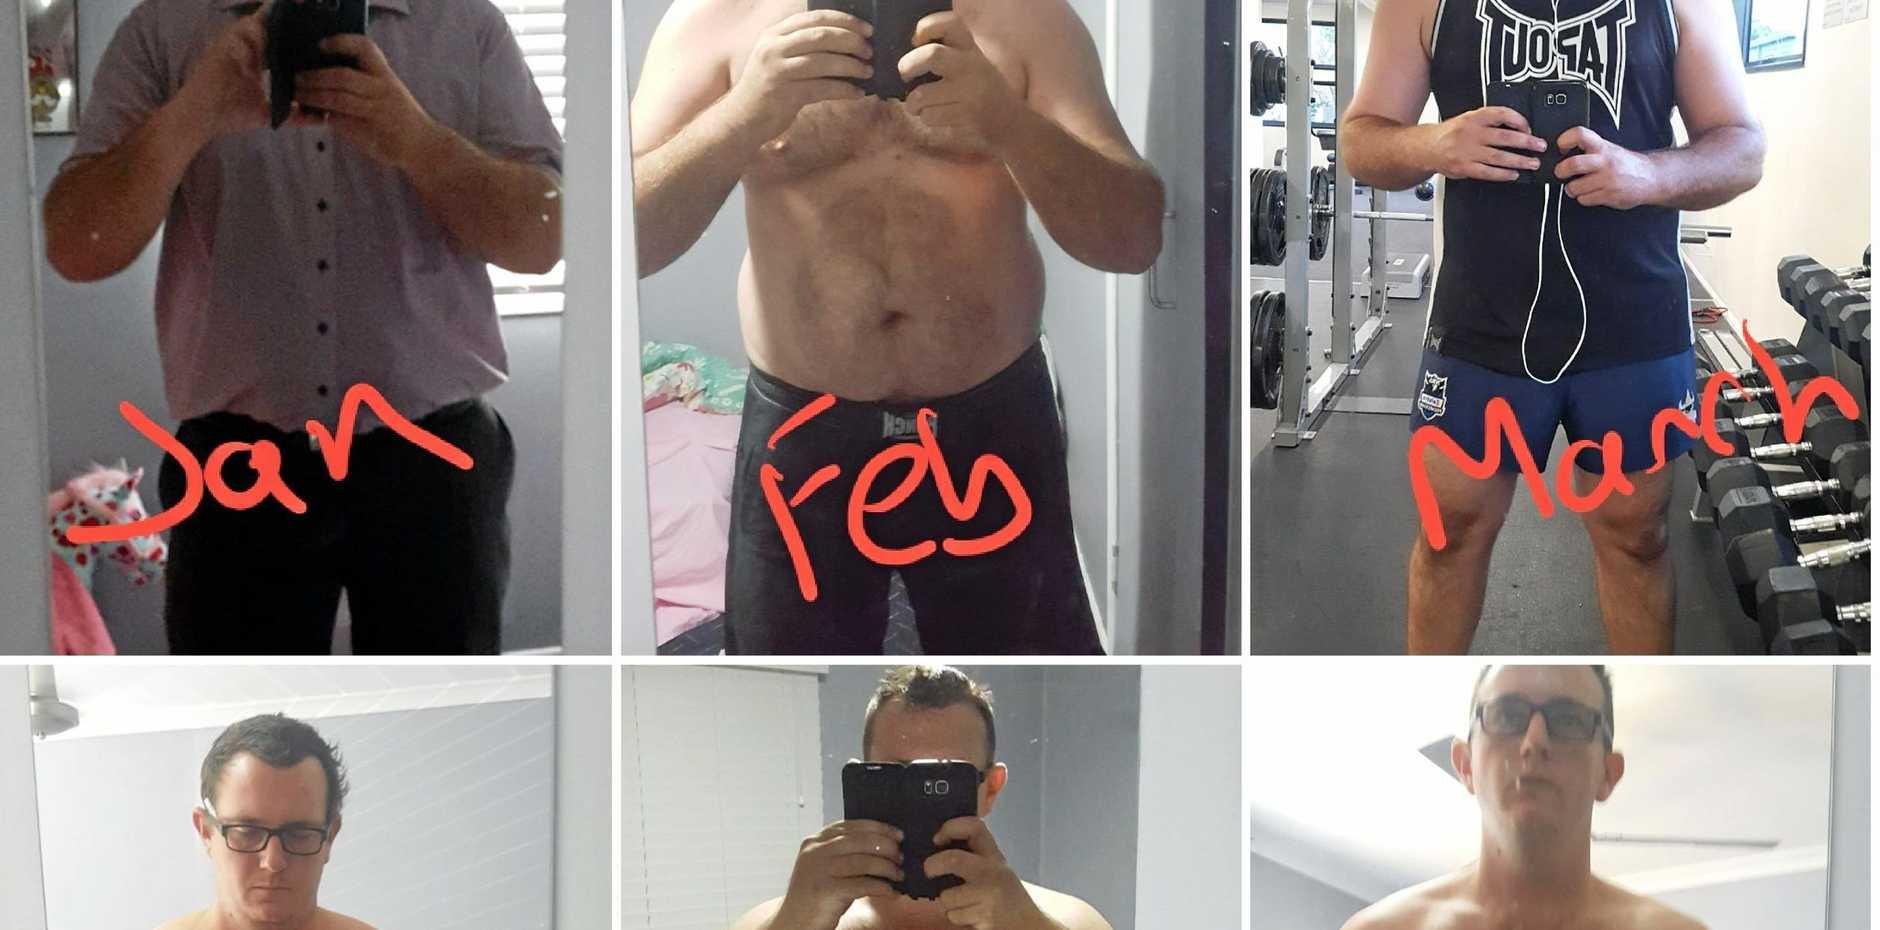 Beginning of a weight loss journey.